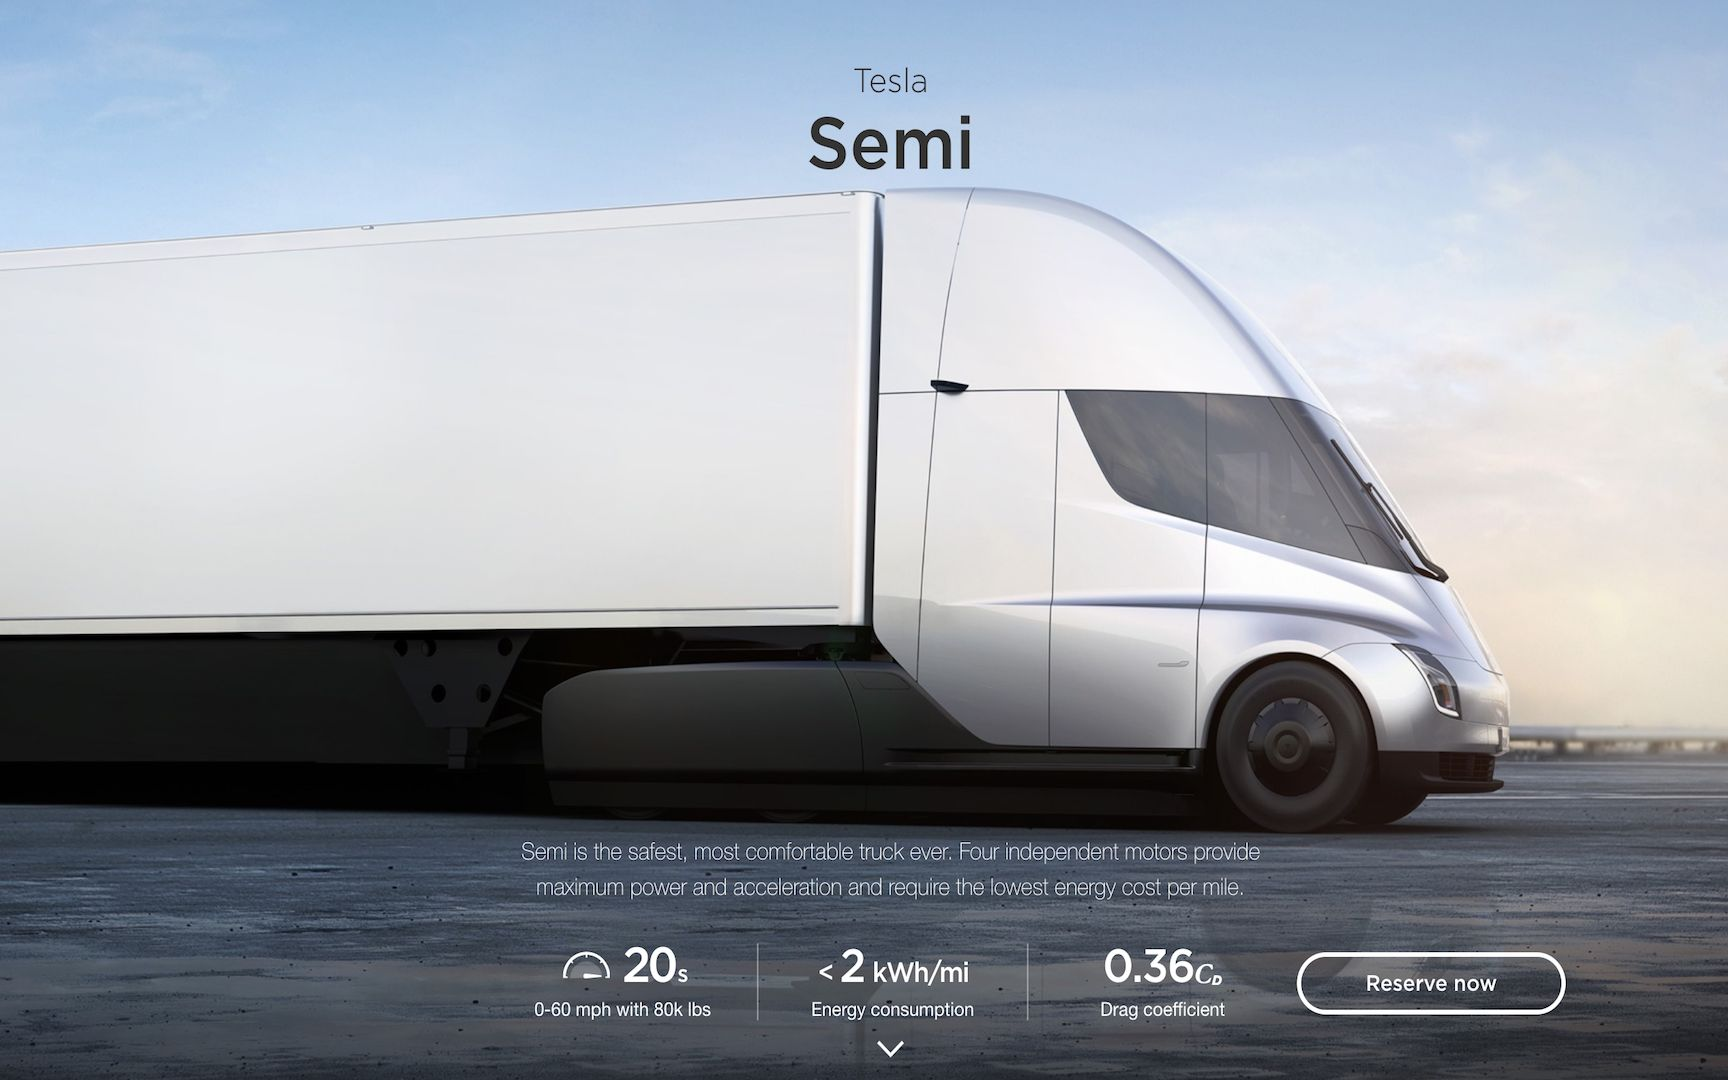 【Tesla】九分钟介绍特斯拉电动卡车Semi和逆天超跑Roadster_汽车_科技_bilibili_哔哩哔哩